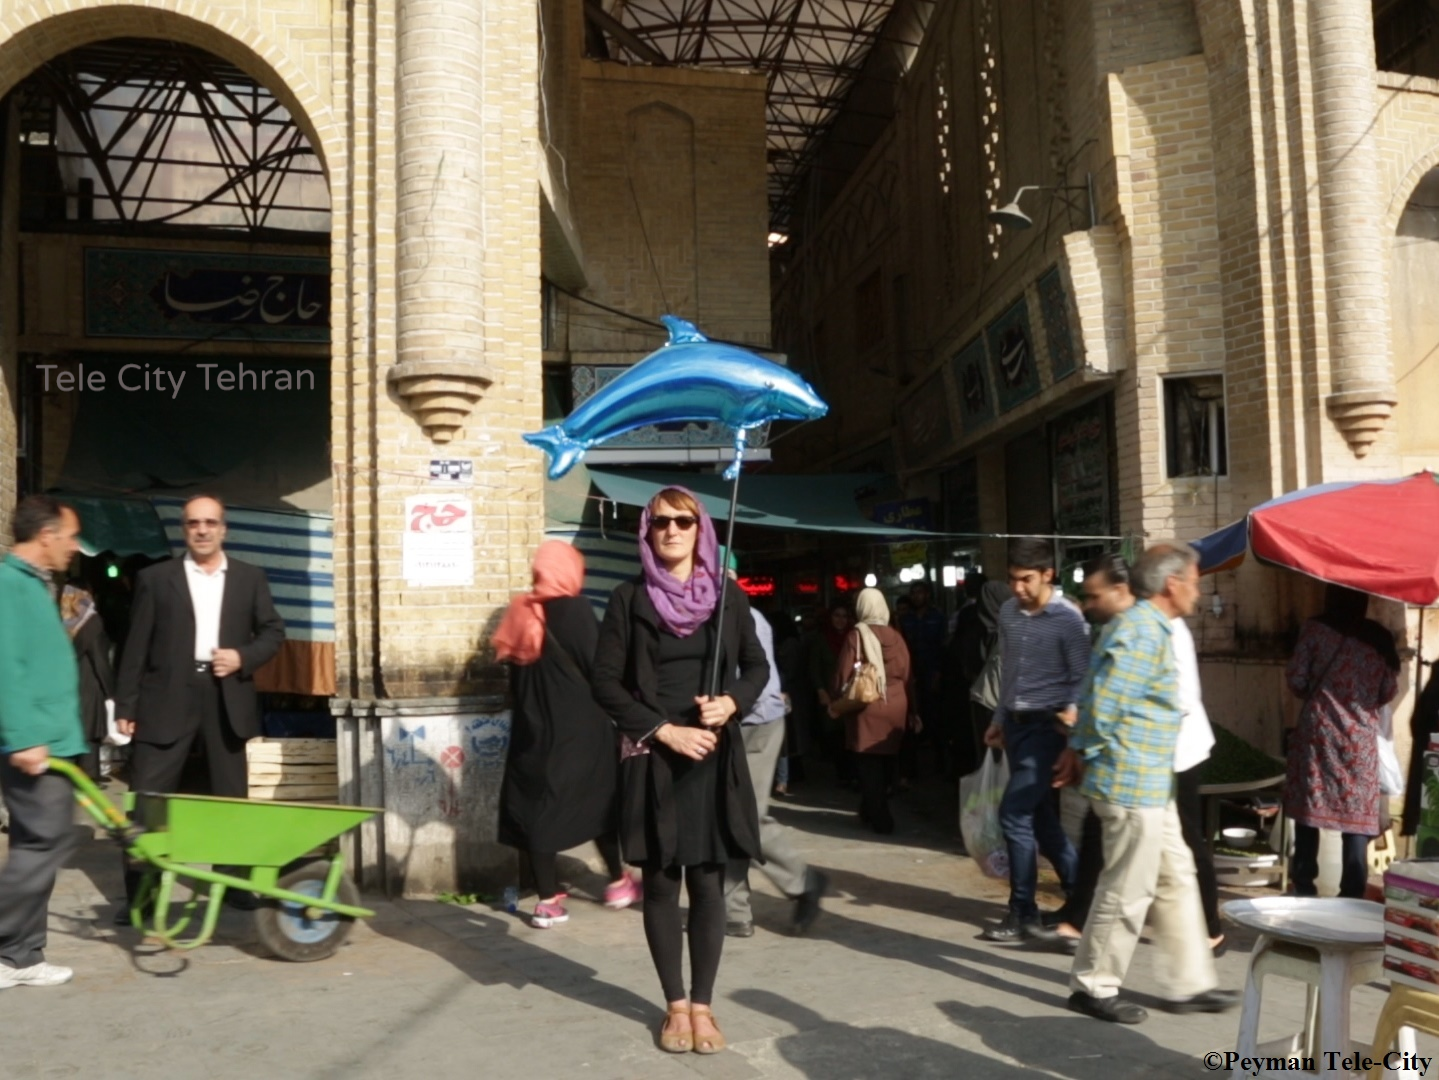 TELE-CITY TEHRAN